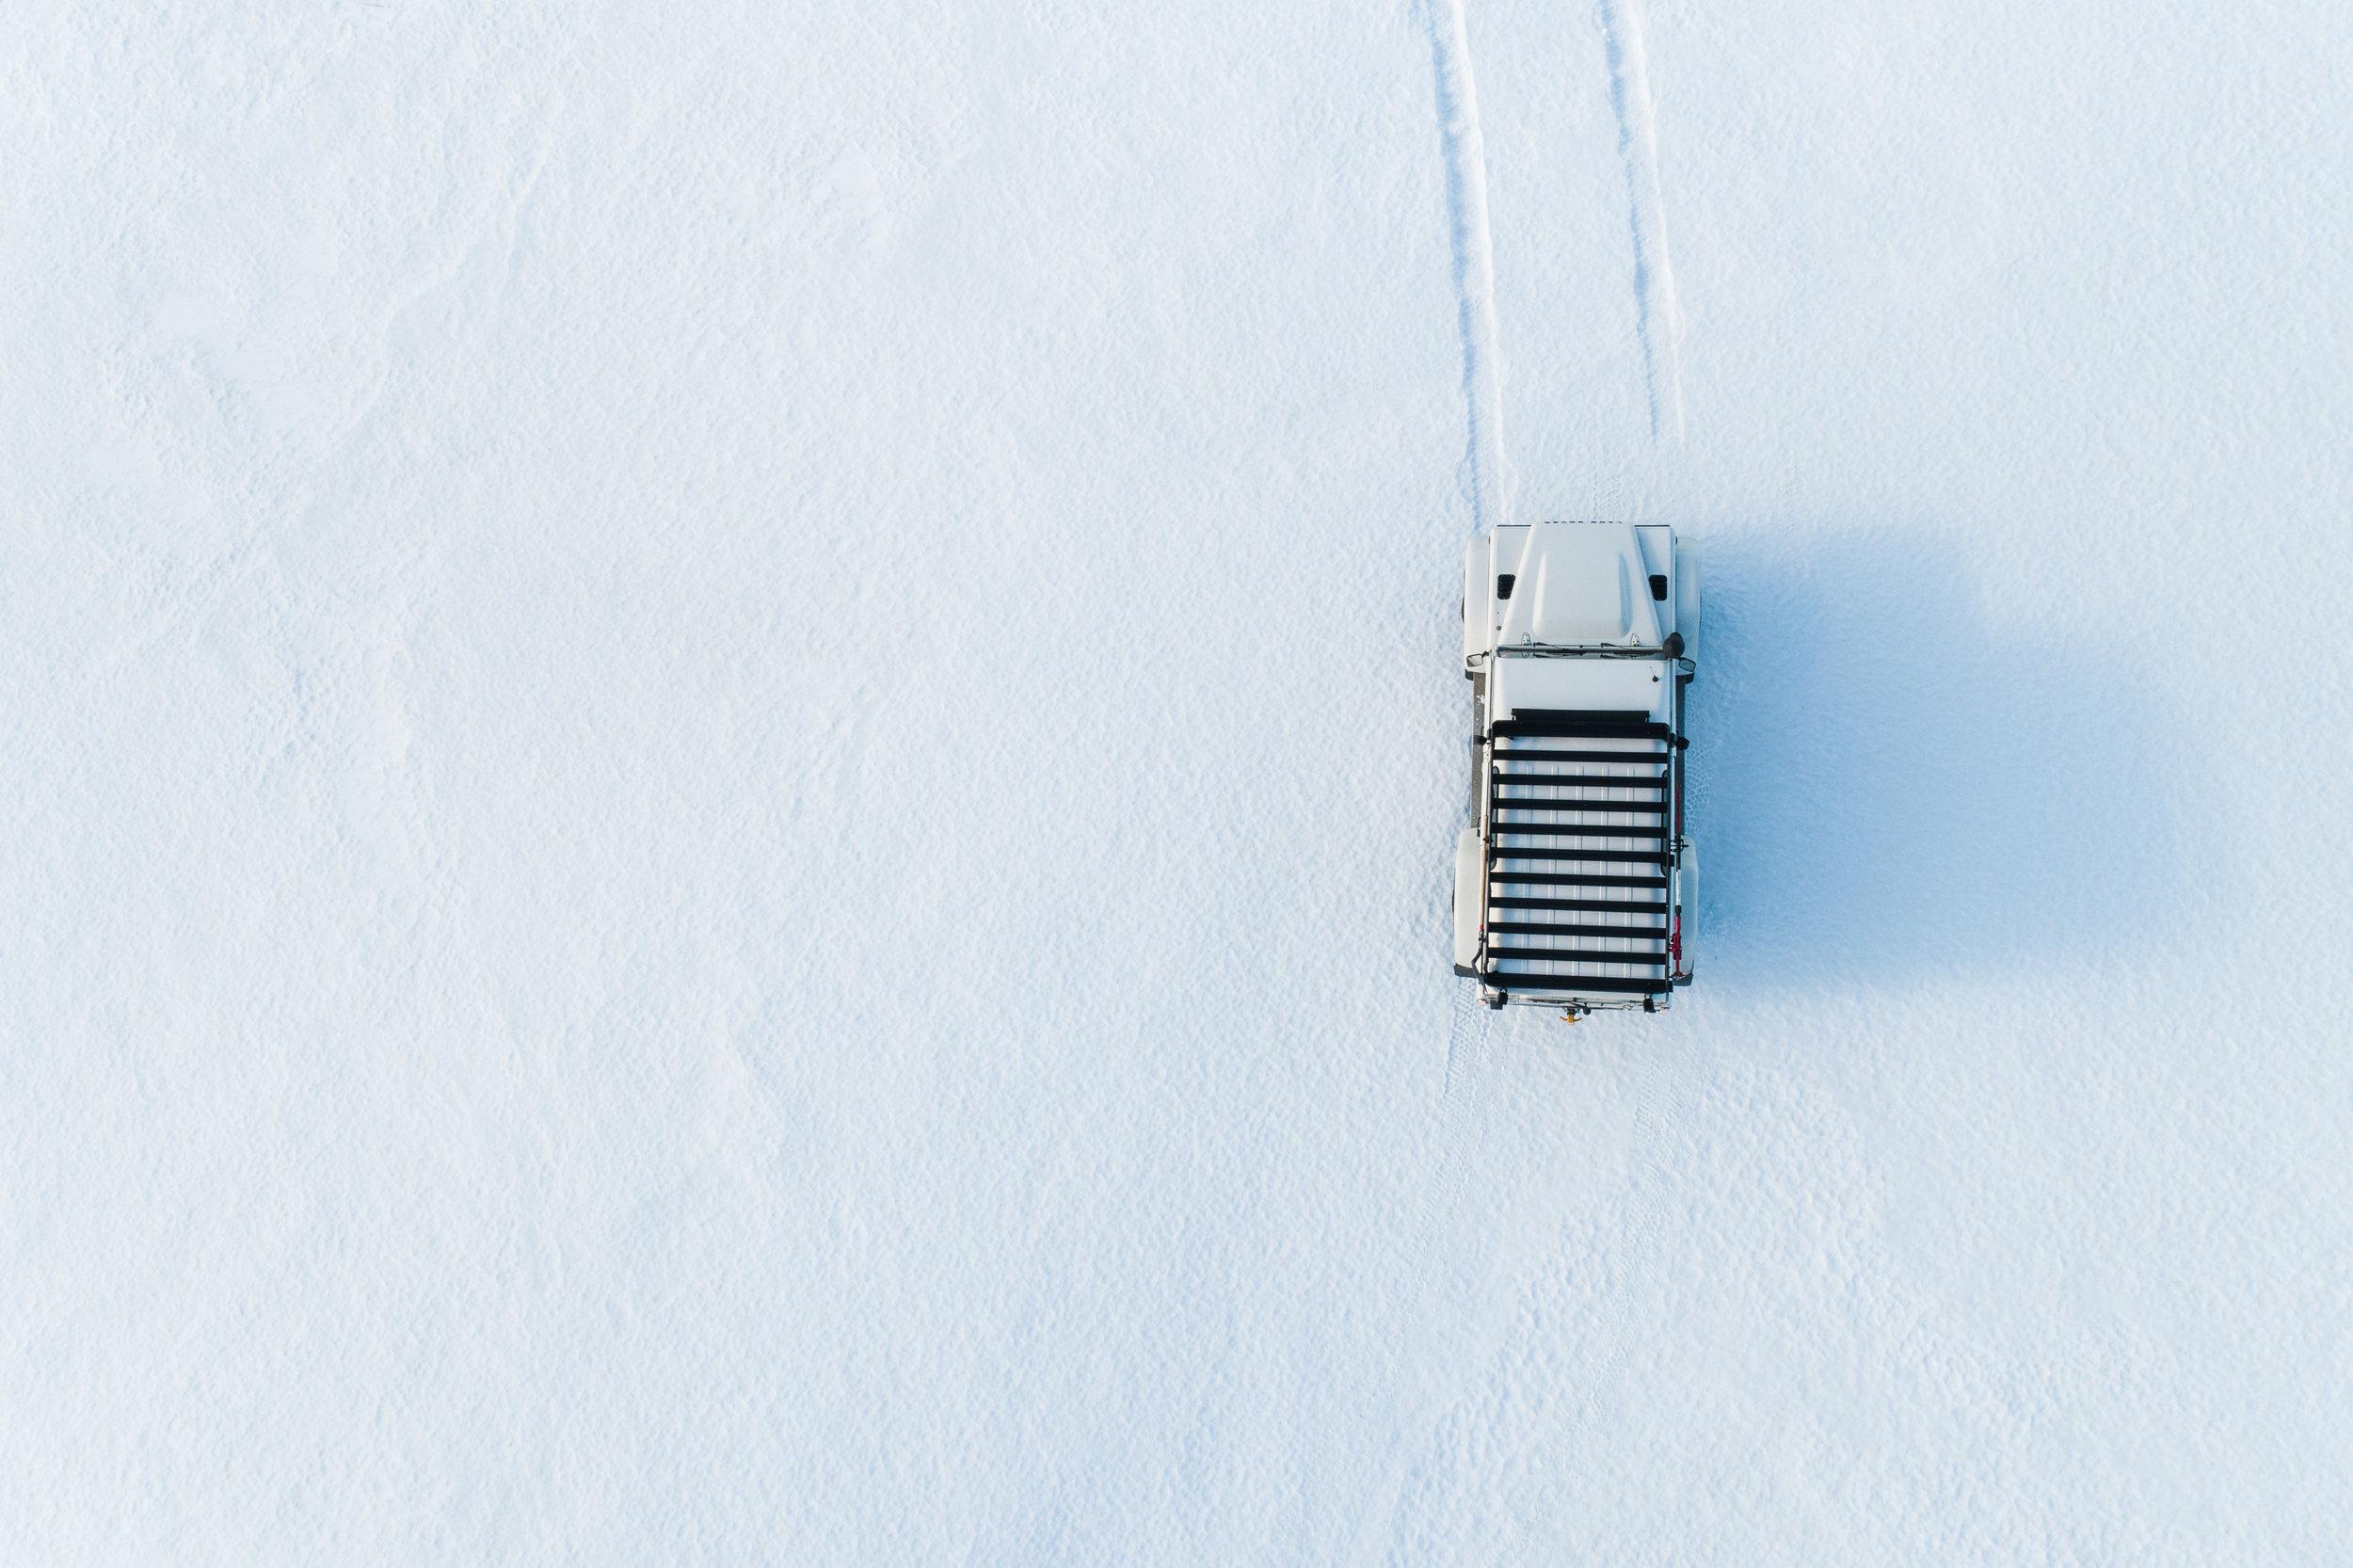 benjamin-hardman-iceland-DJI_0187.jpg